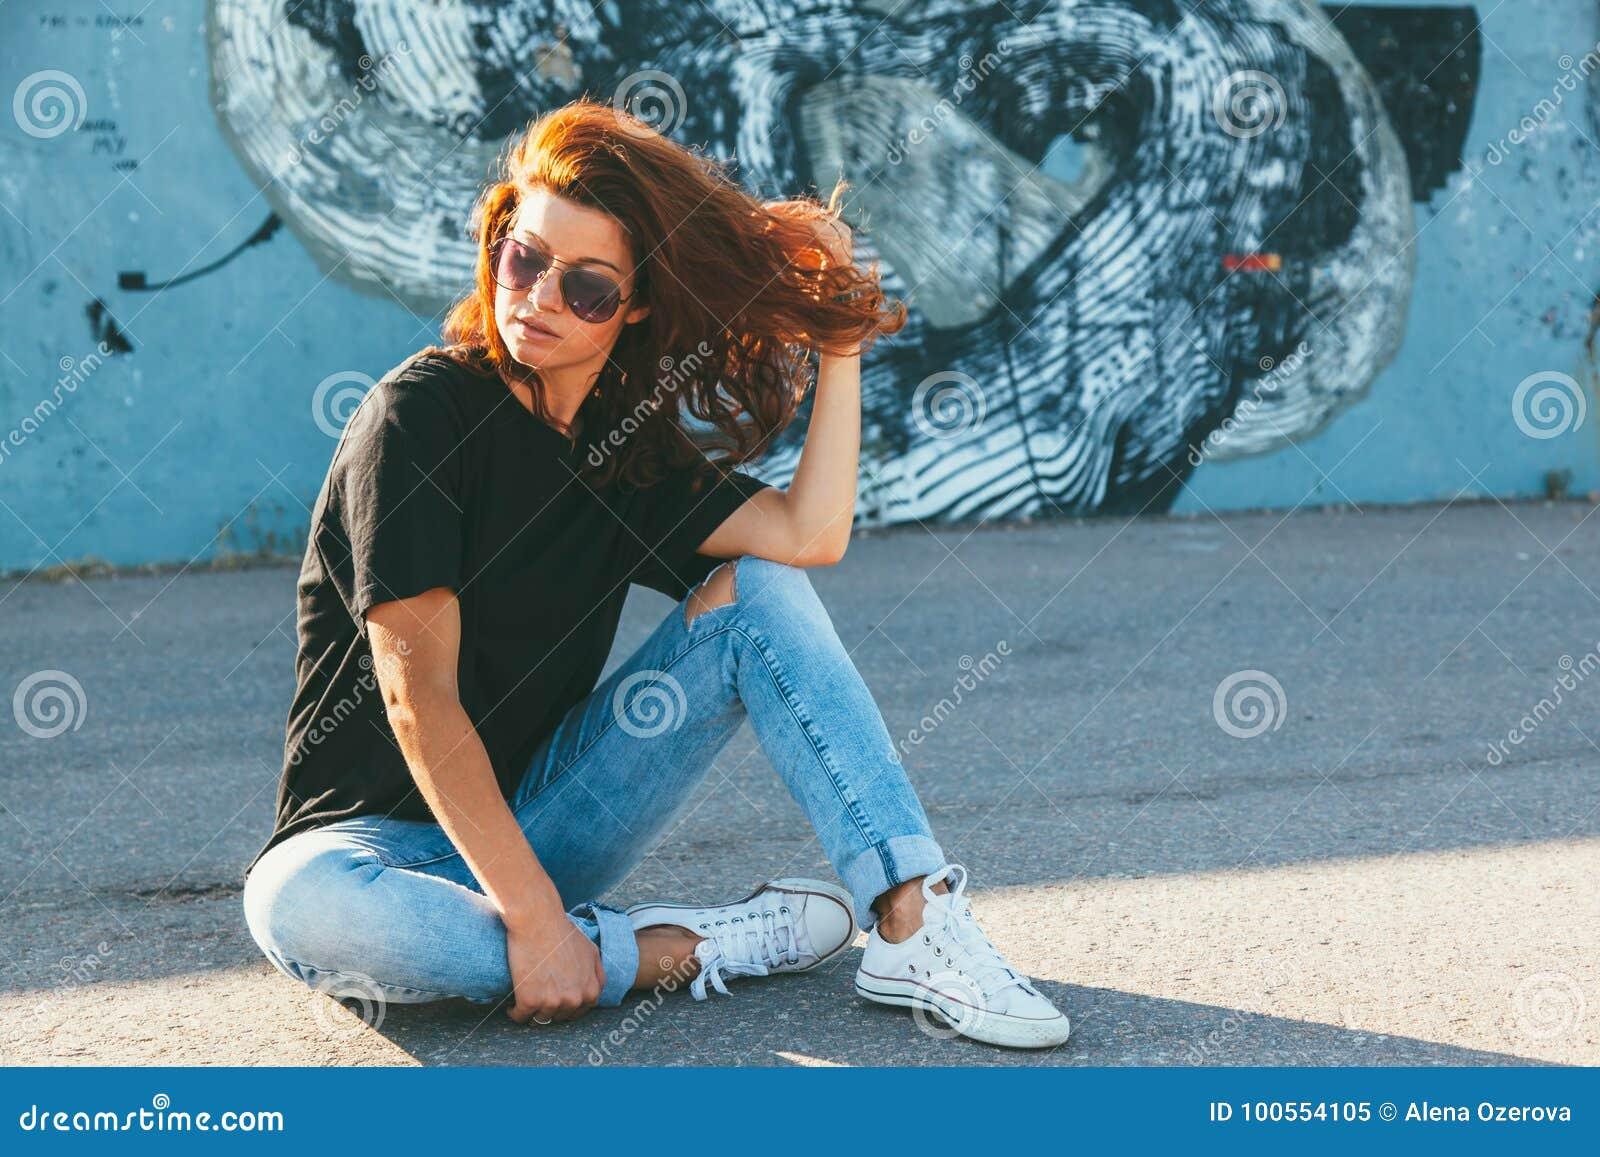 Free plain teen pics